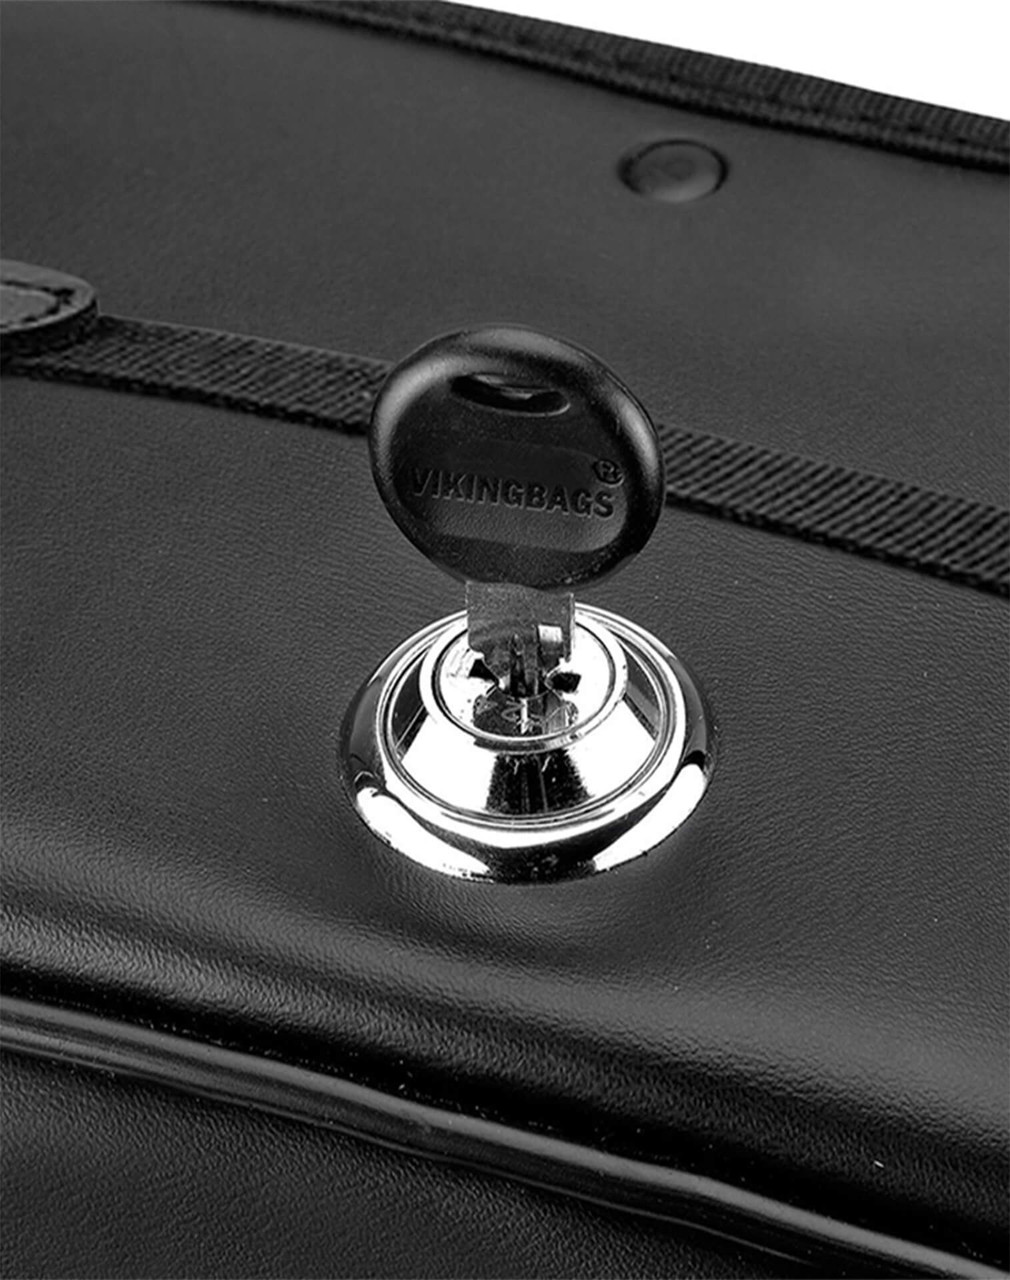 Honda 1500 Valkyrie Standard Spear Shock Cutout Studded Motorcycle saddlebags Key Lock View